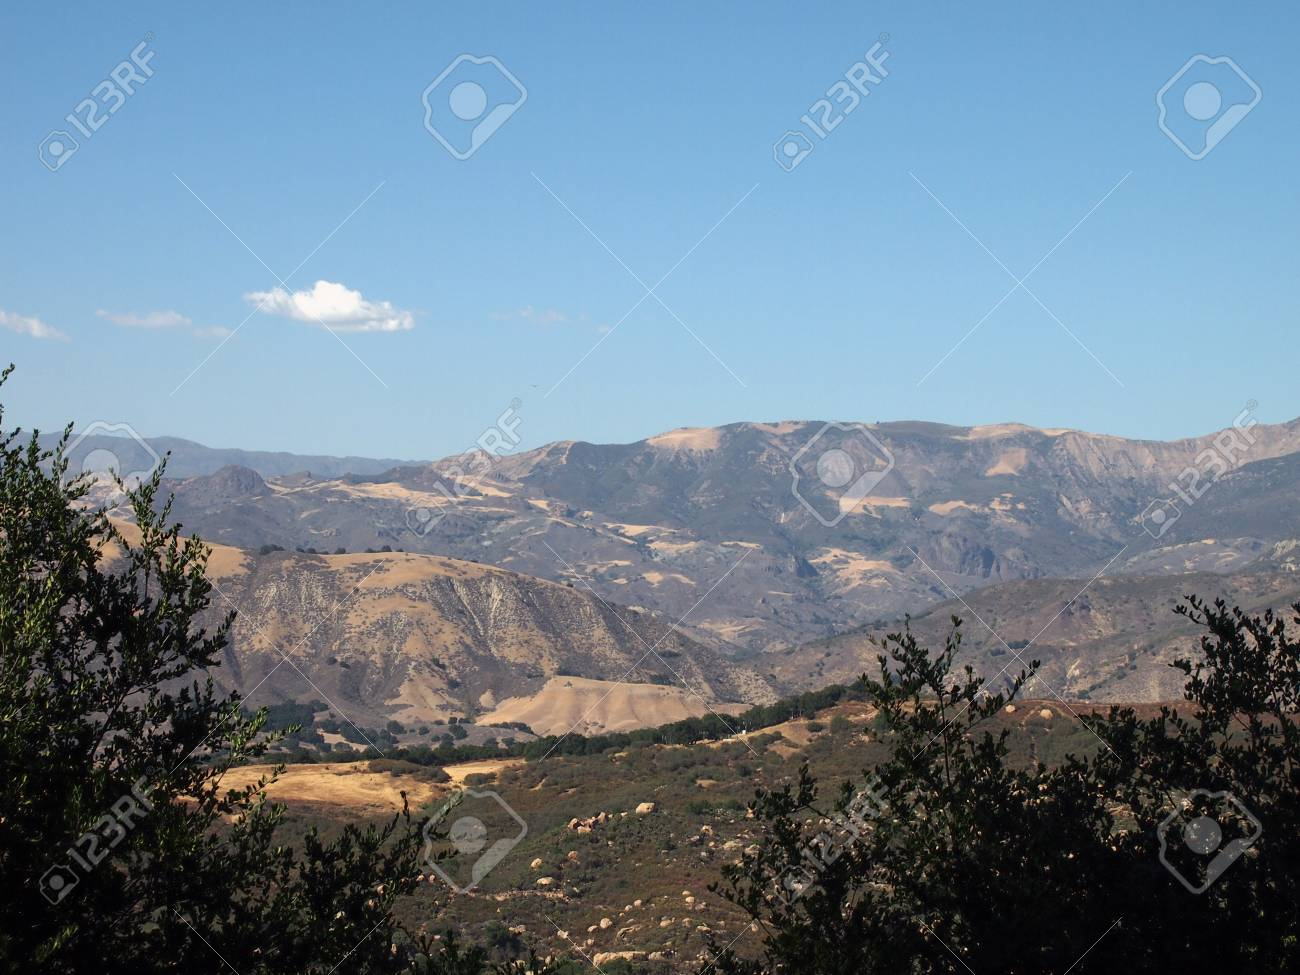 Mountain Landscape of California seen over tops of trees in Santa Barbara area Stock Photo - 18153579